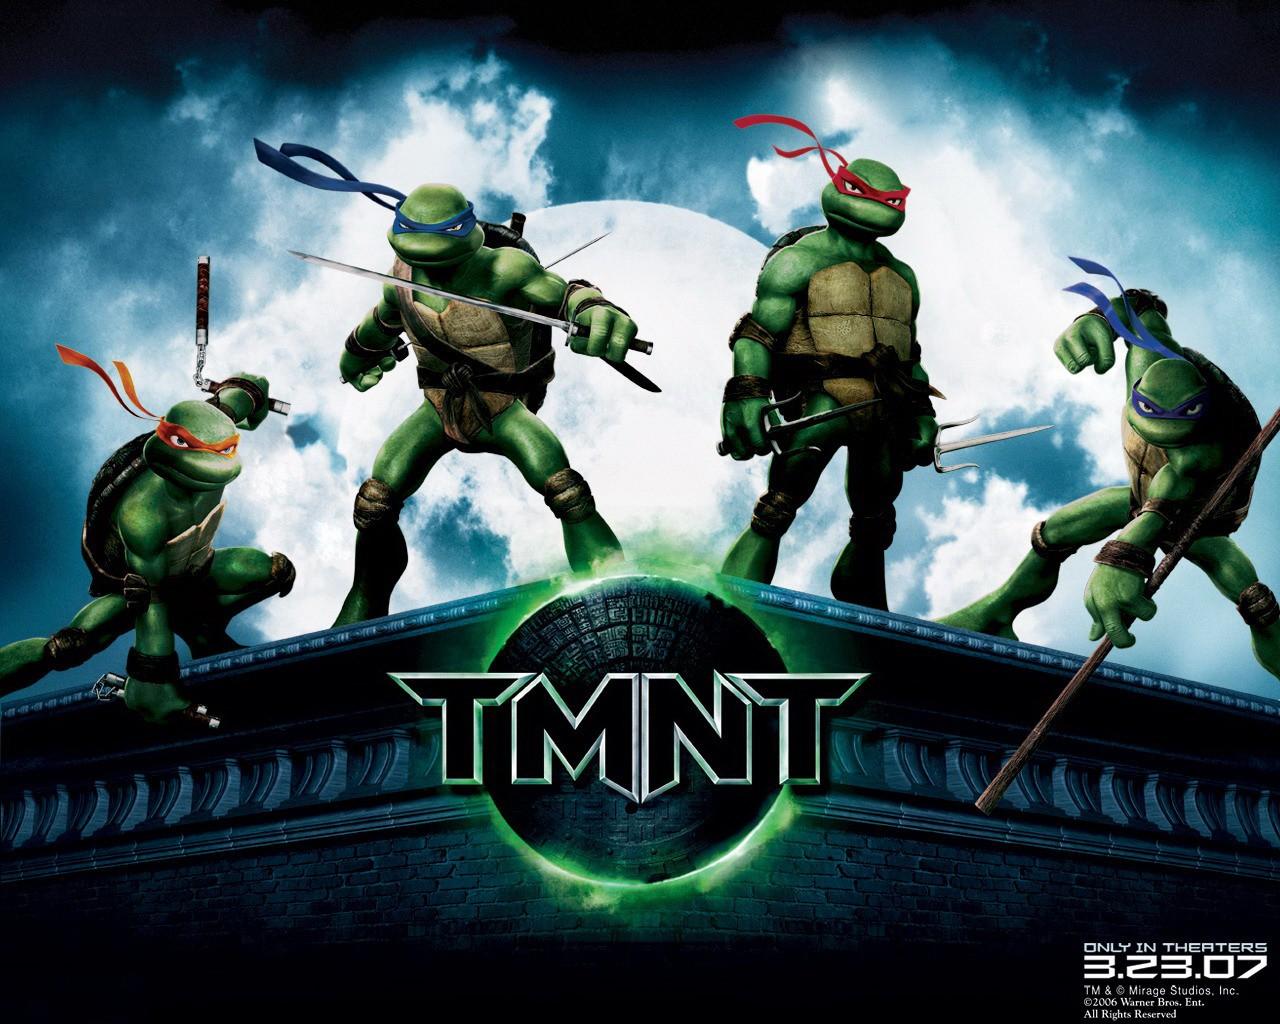 Wallpaper delle quattro tartarughe ninja del film 'TMNT: Teenage Mutant Ninja Turtles'